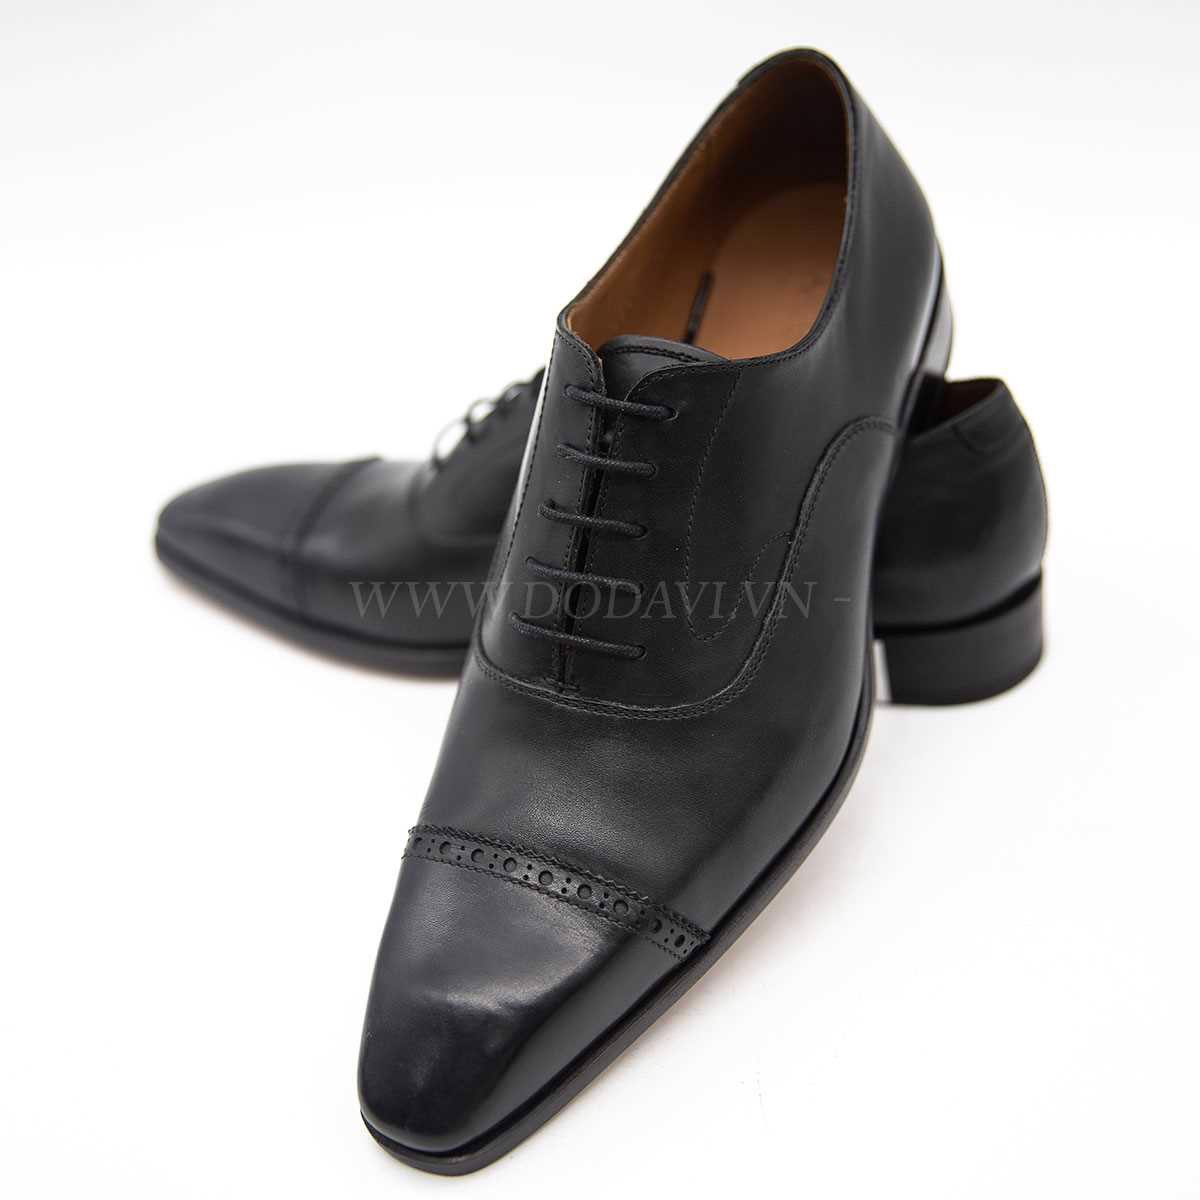 Giày đế da 79430